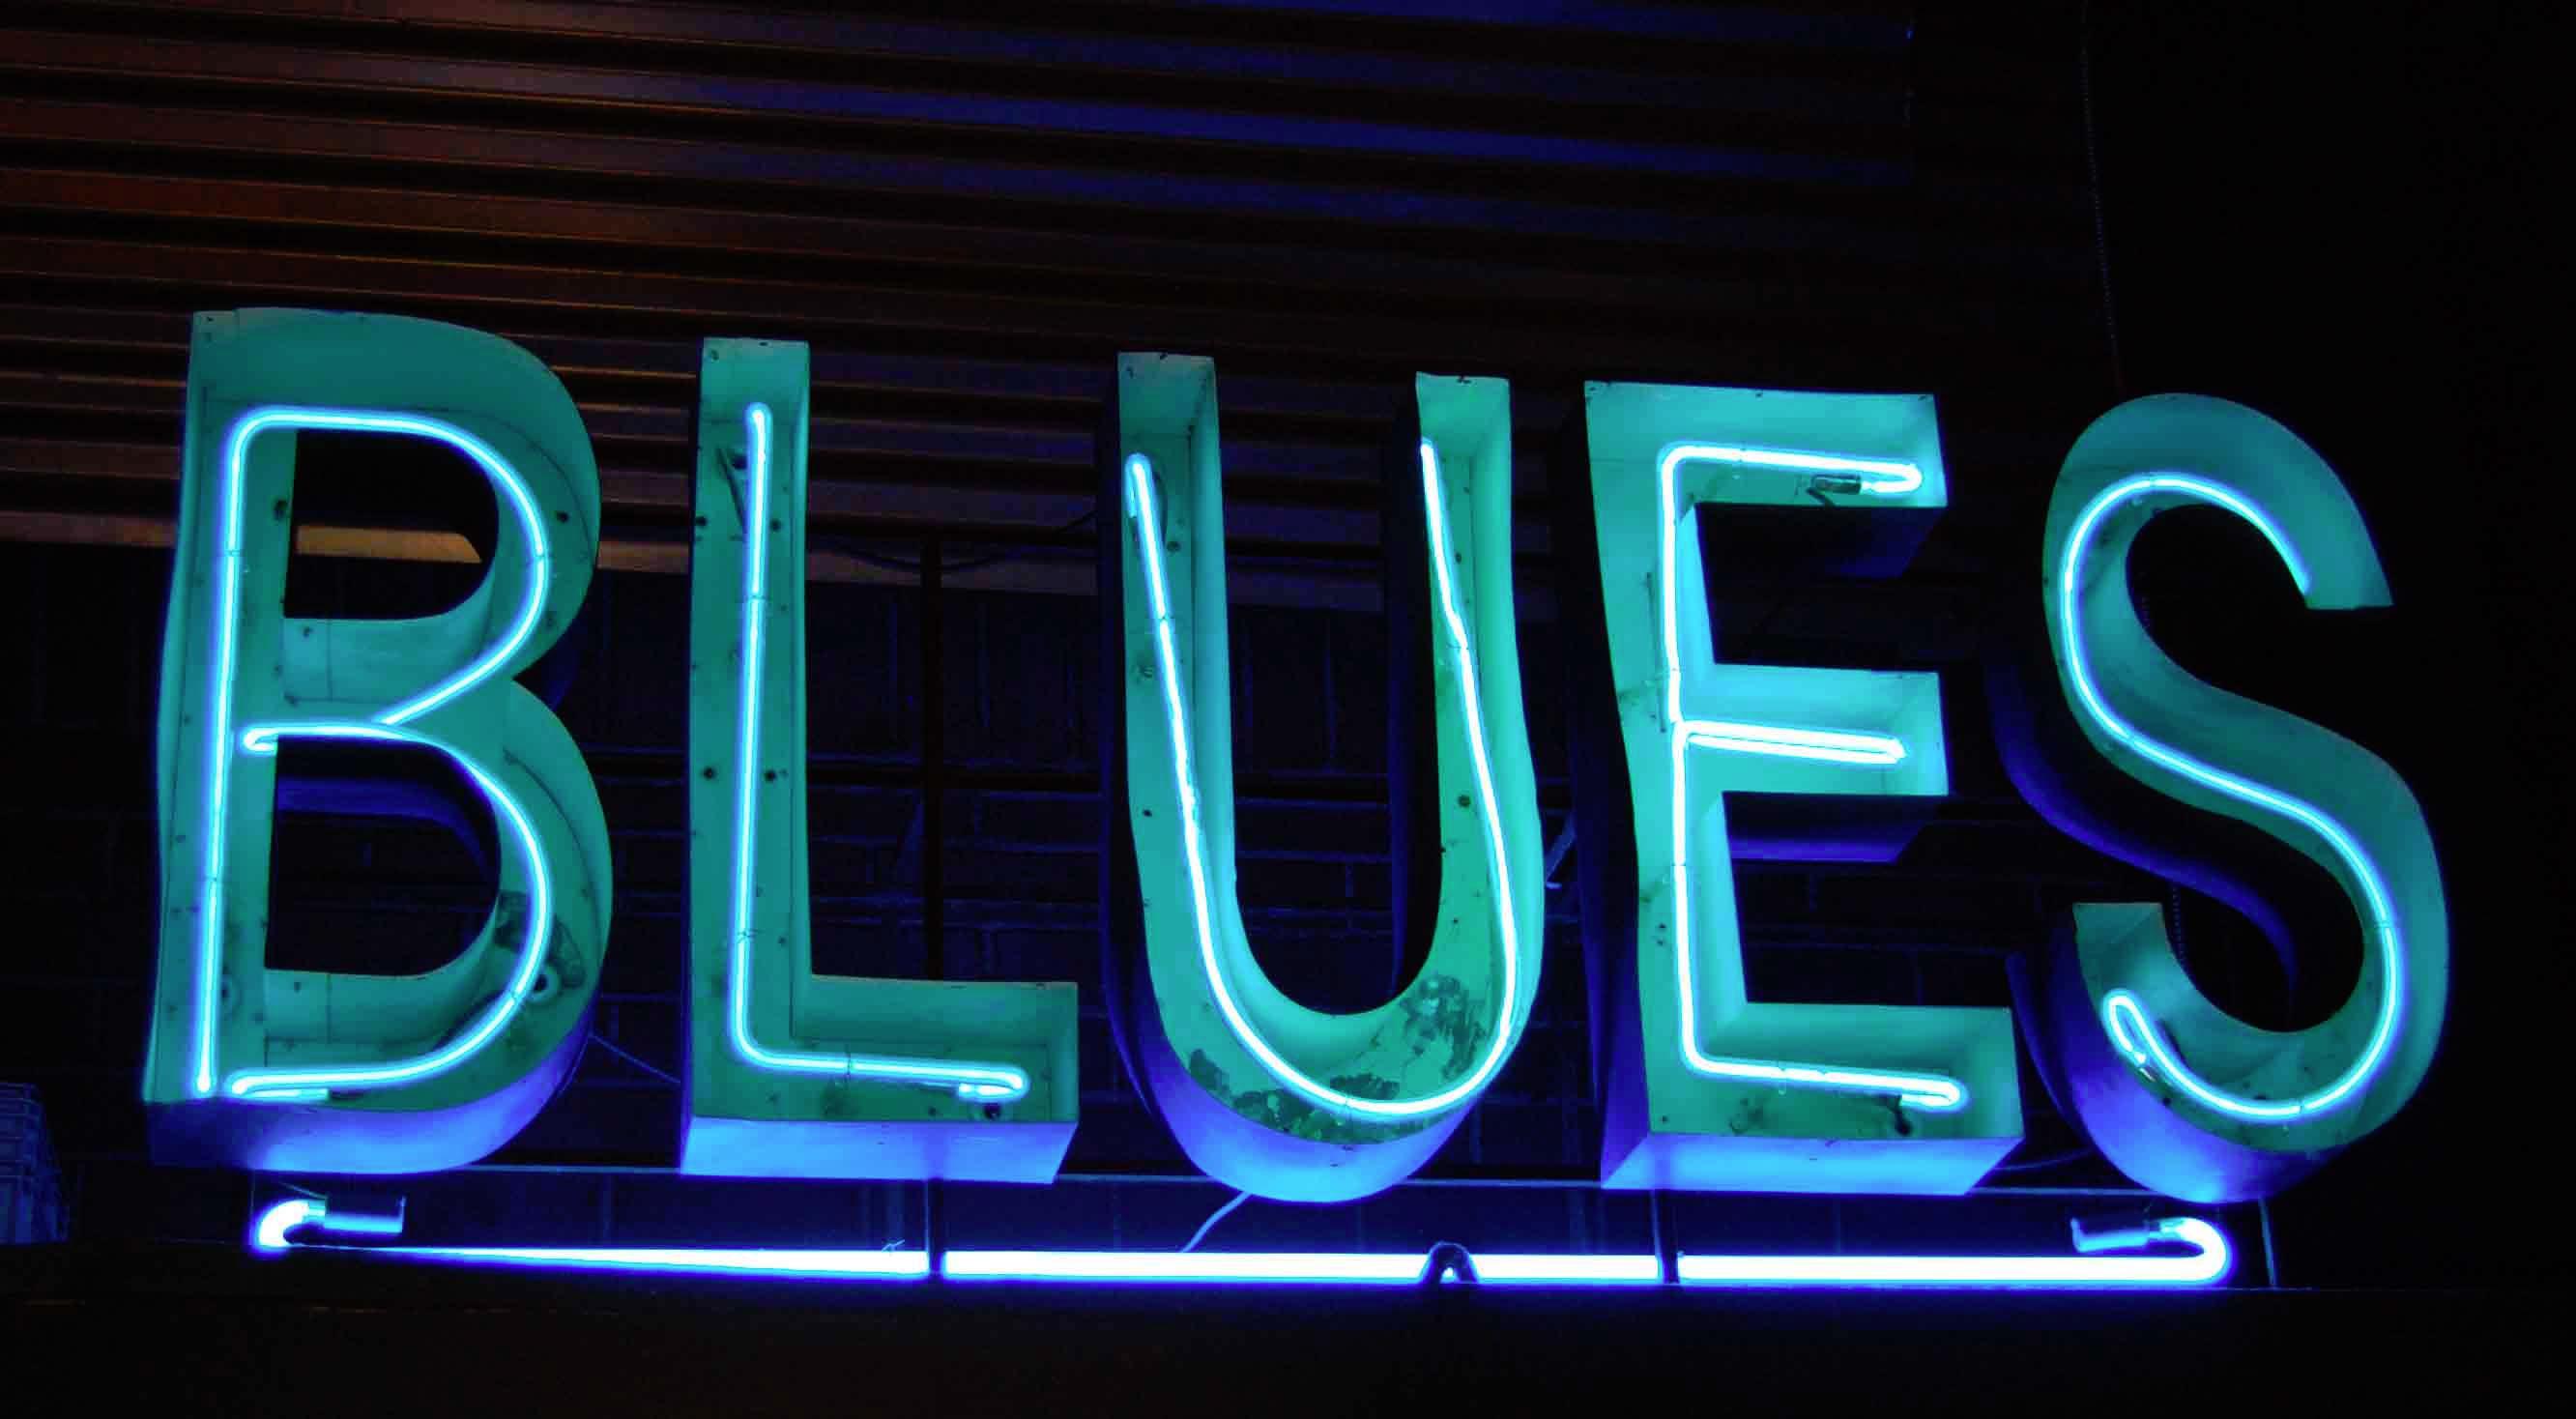 Design Celebrates- International Blues Music Day international blues music day Mid-Century Design Celebrates: International Blues Music Day Mid Century Design Celebrates International Blues Music Day 6